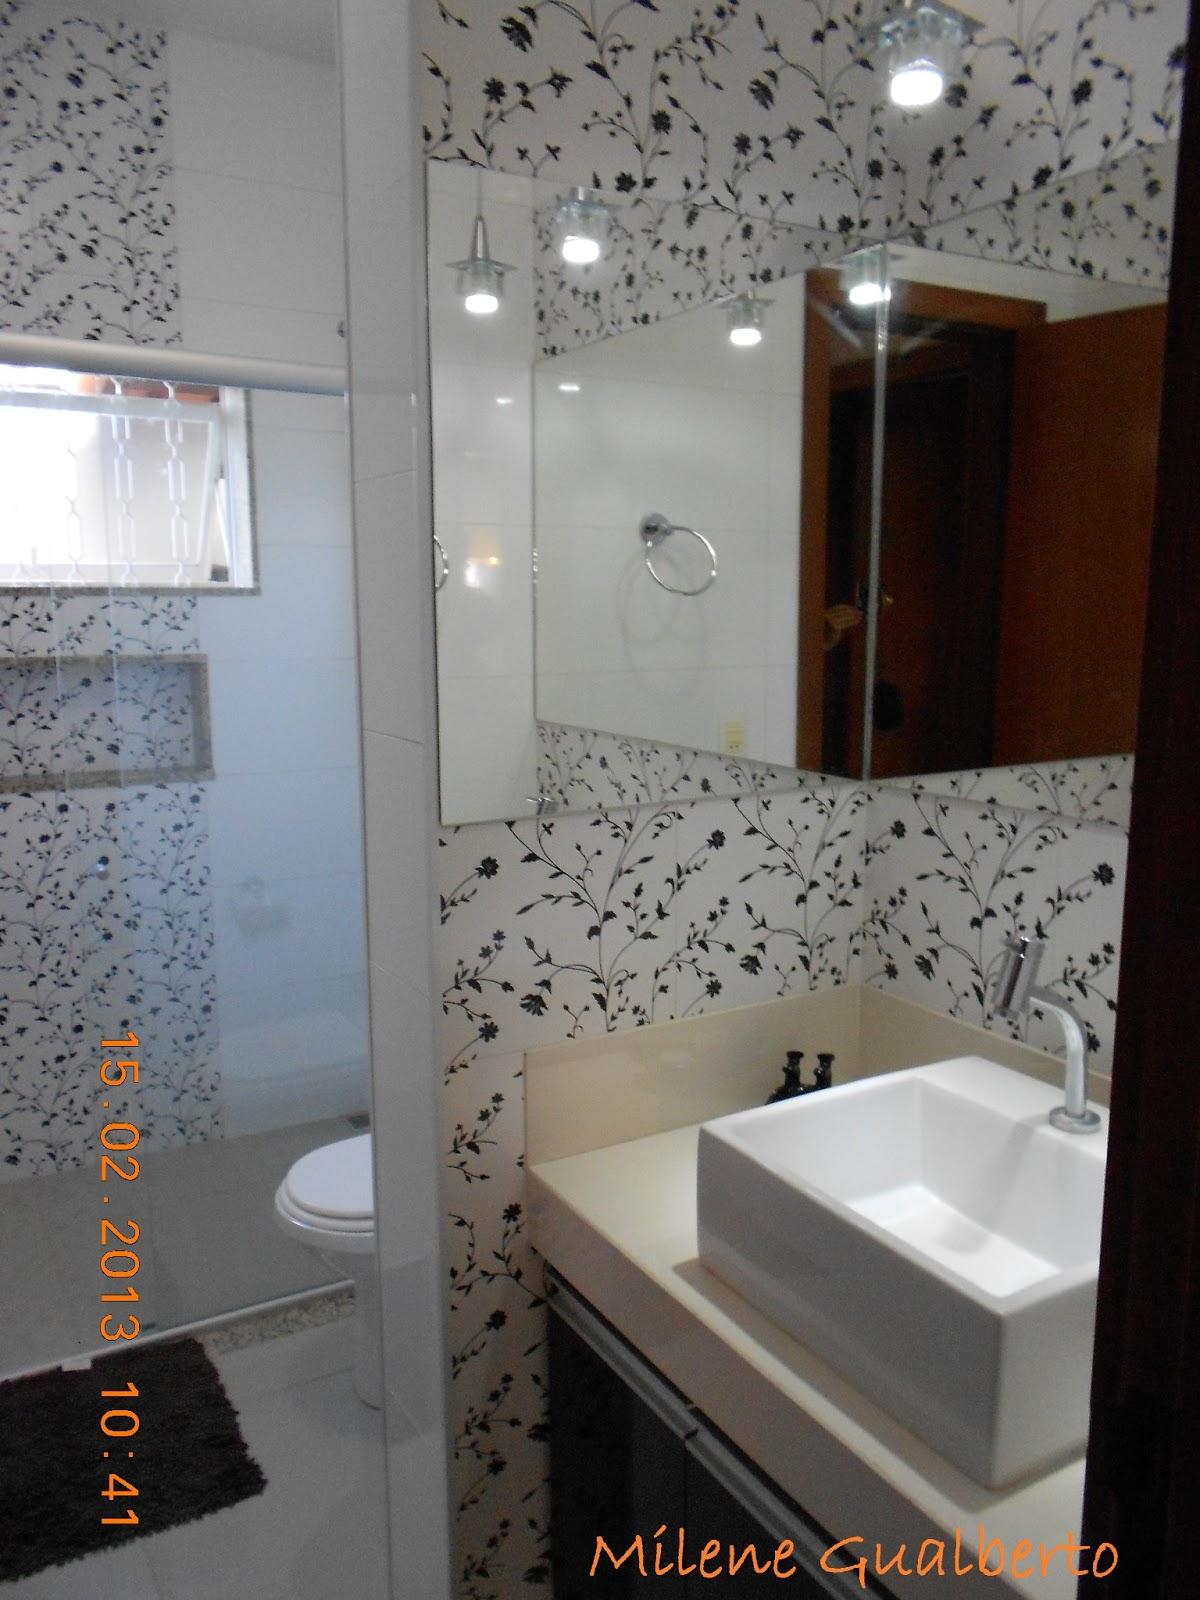 Bancada de porcelanato polido: Arte Pedras #A75C24 1200x1600 Banheiro Branco Preto E Cinza